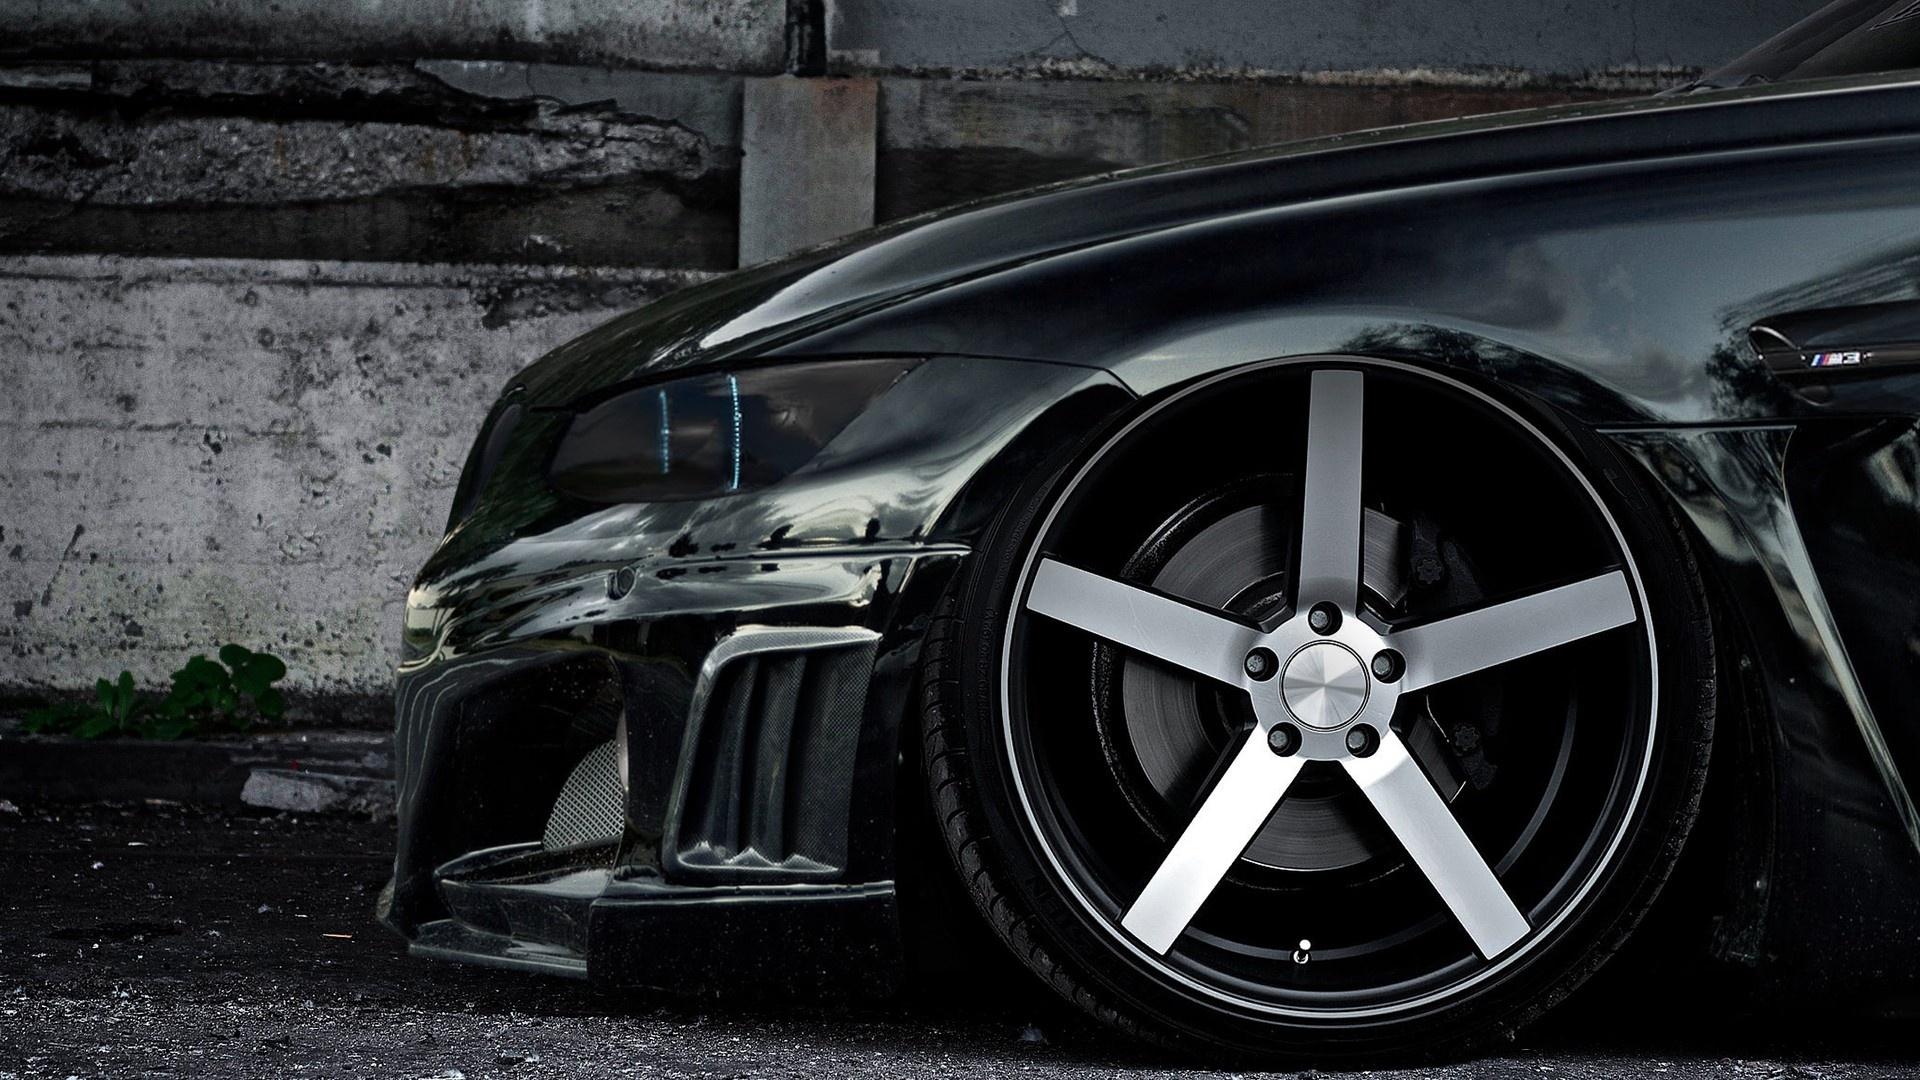 Cool Car Wheels Wallpaper - Cool rims for cars